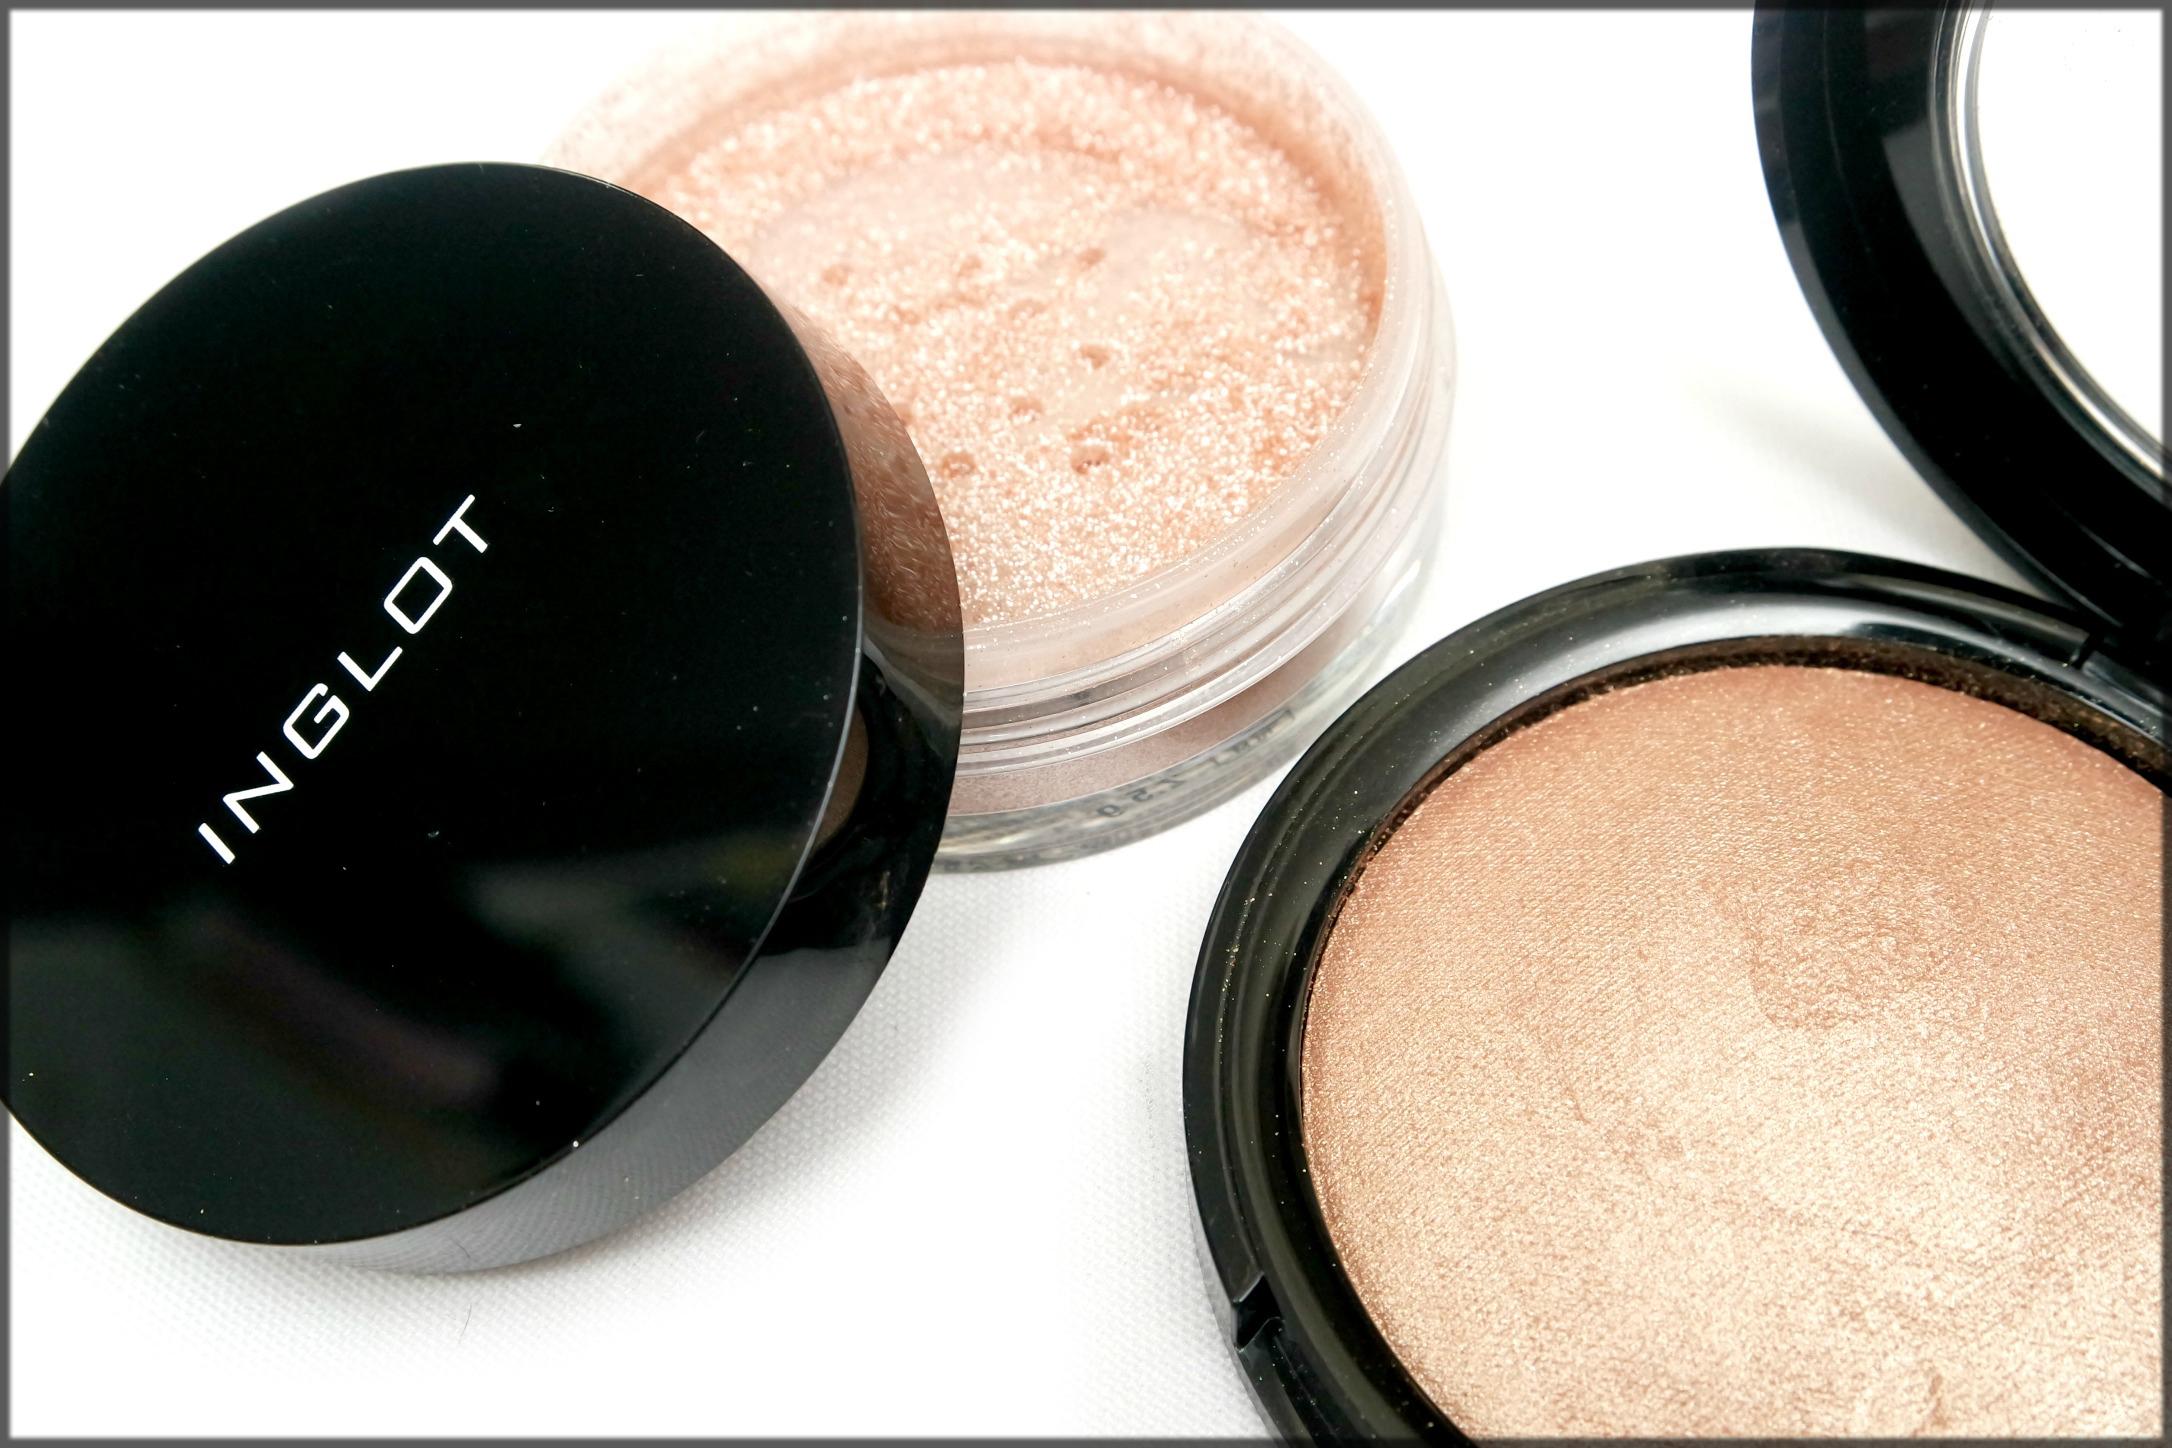 Inglot Powder highlighter for all skin tones